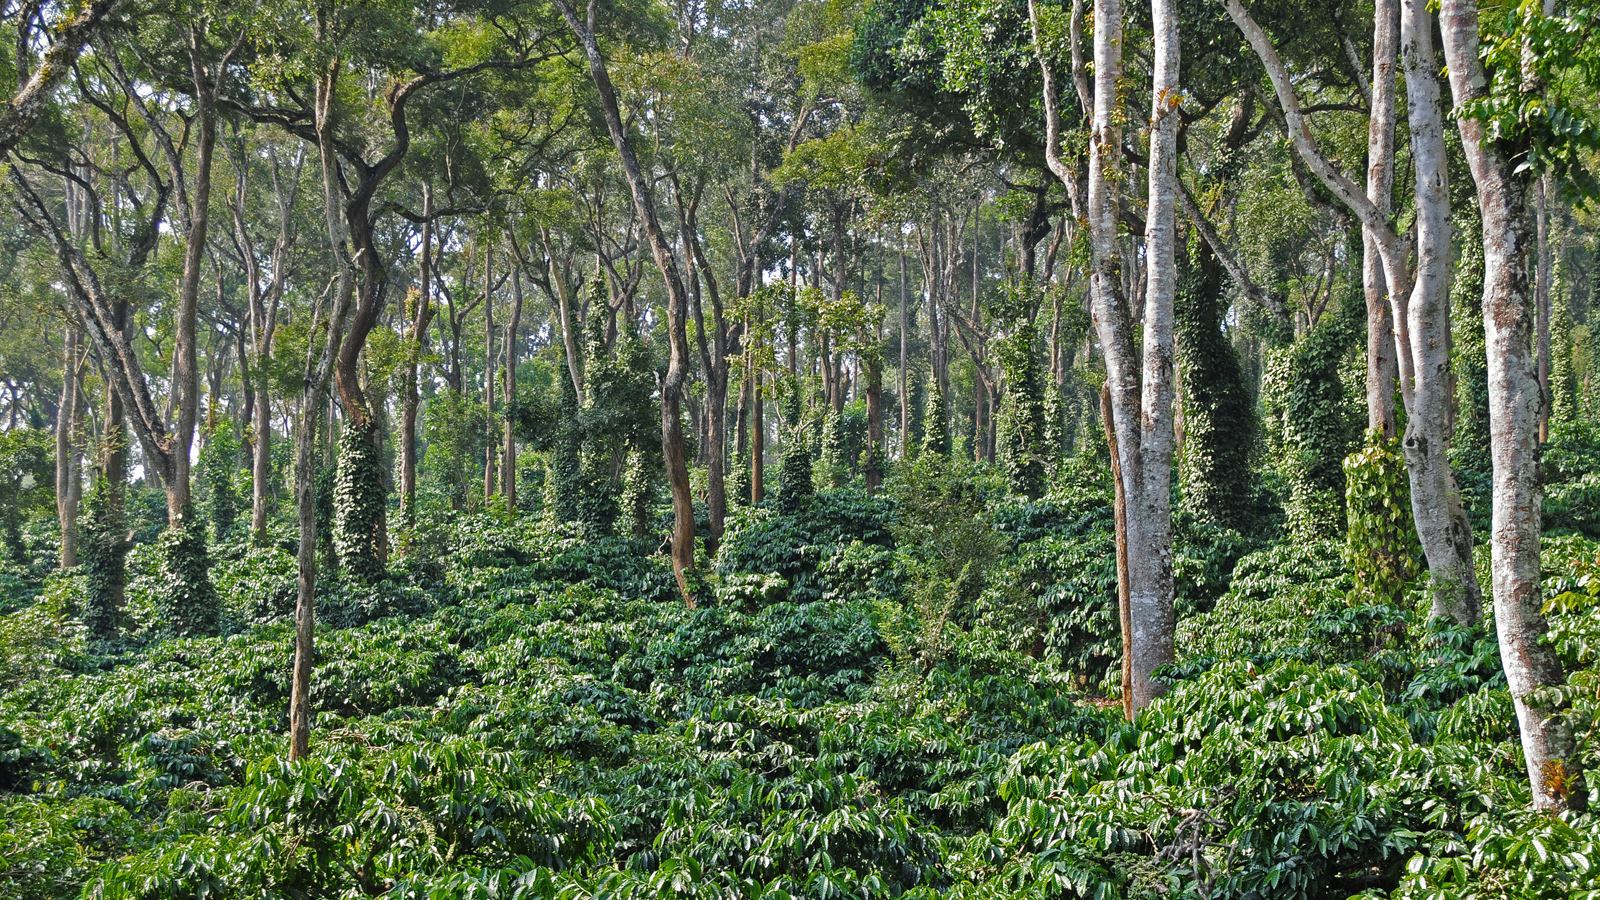 Evolve Back: One of India's greenest resorts